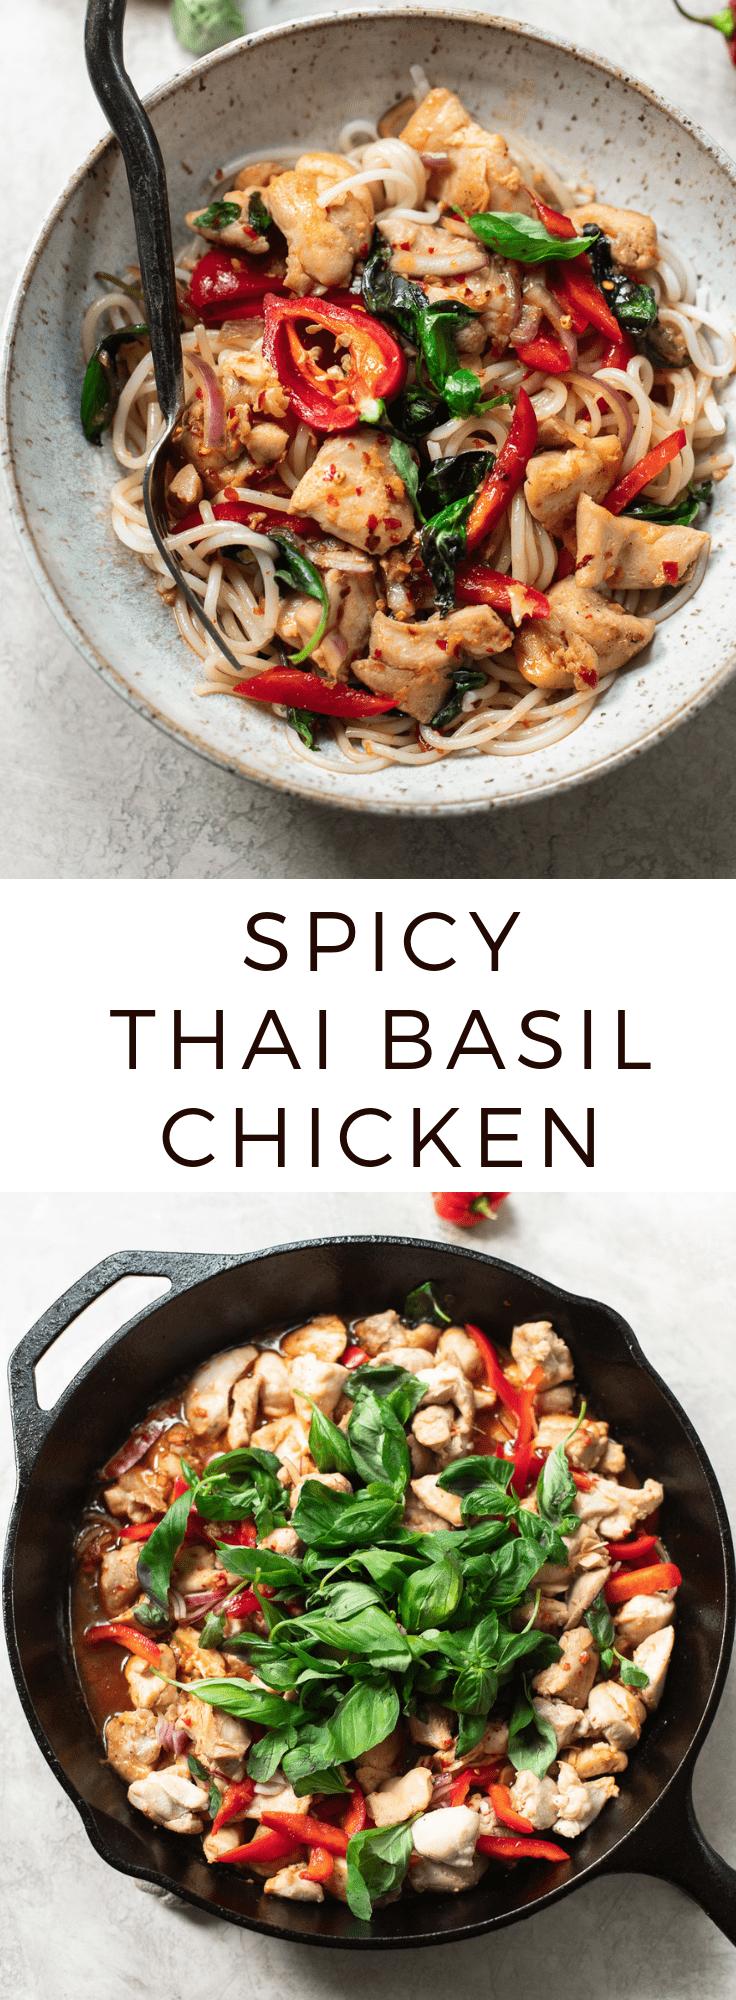 Thai Basil Chicken with Chili Garlic Sauce #lowcarb #chicken #spicy #thaifood #dinner #easy #quickrecipe